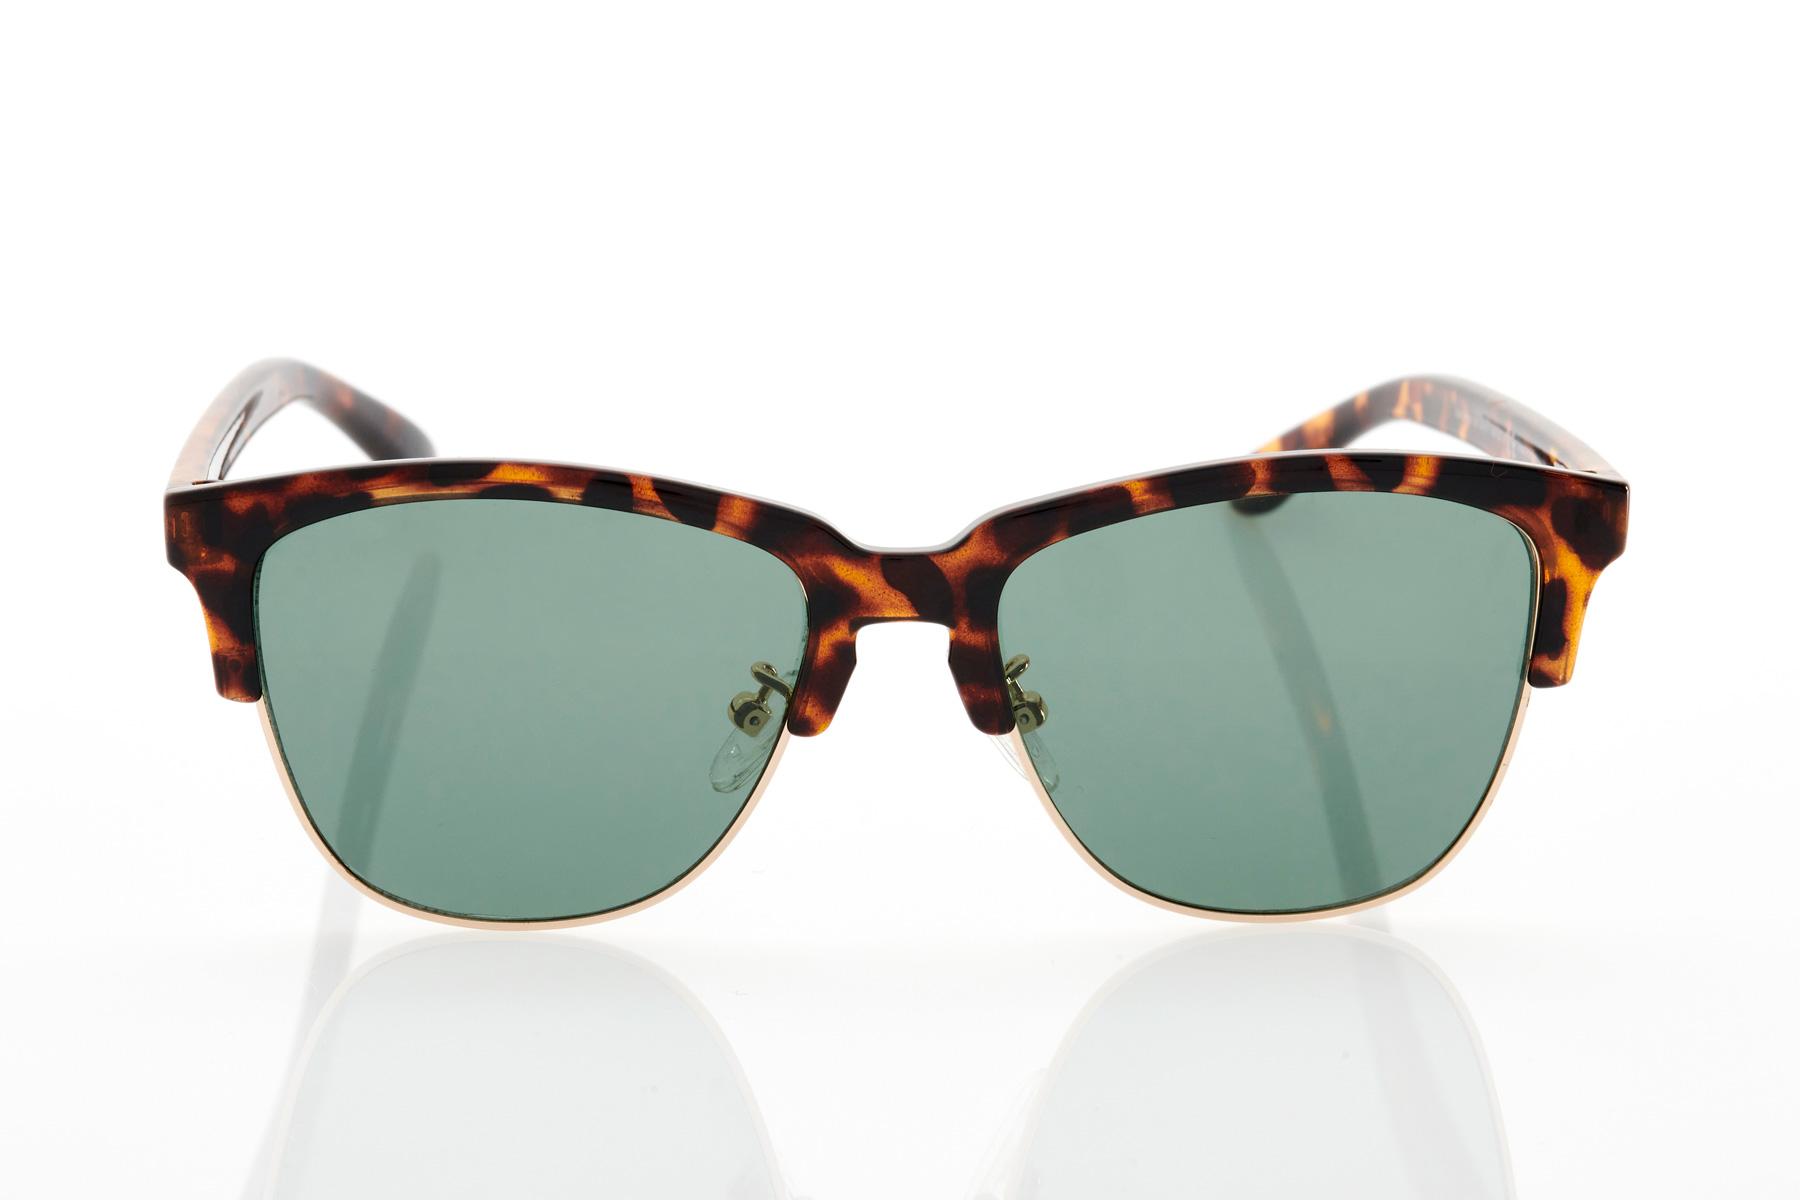 Tortoise Male Sunglasses Hawkers New Classic Green